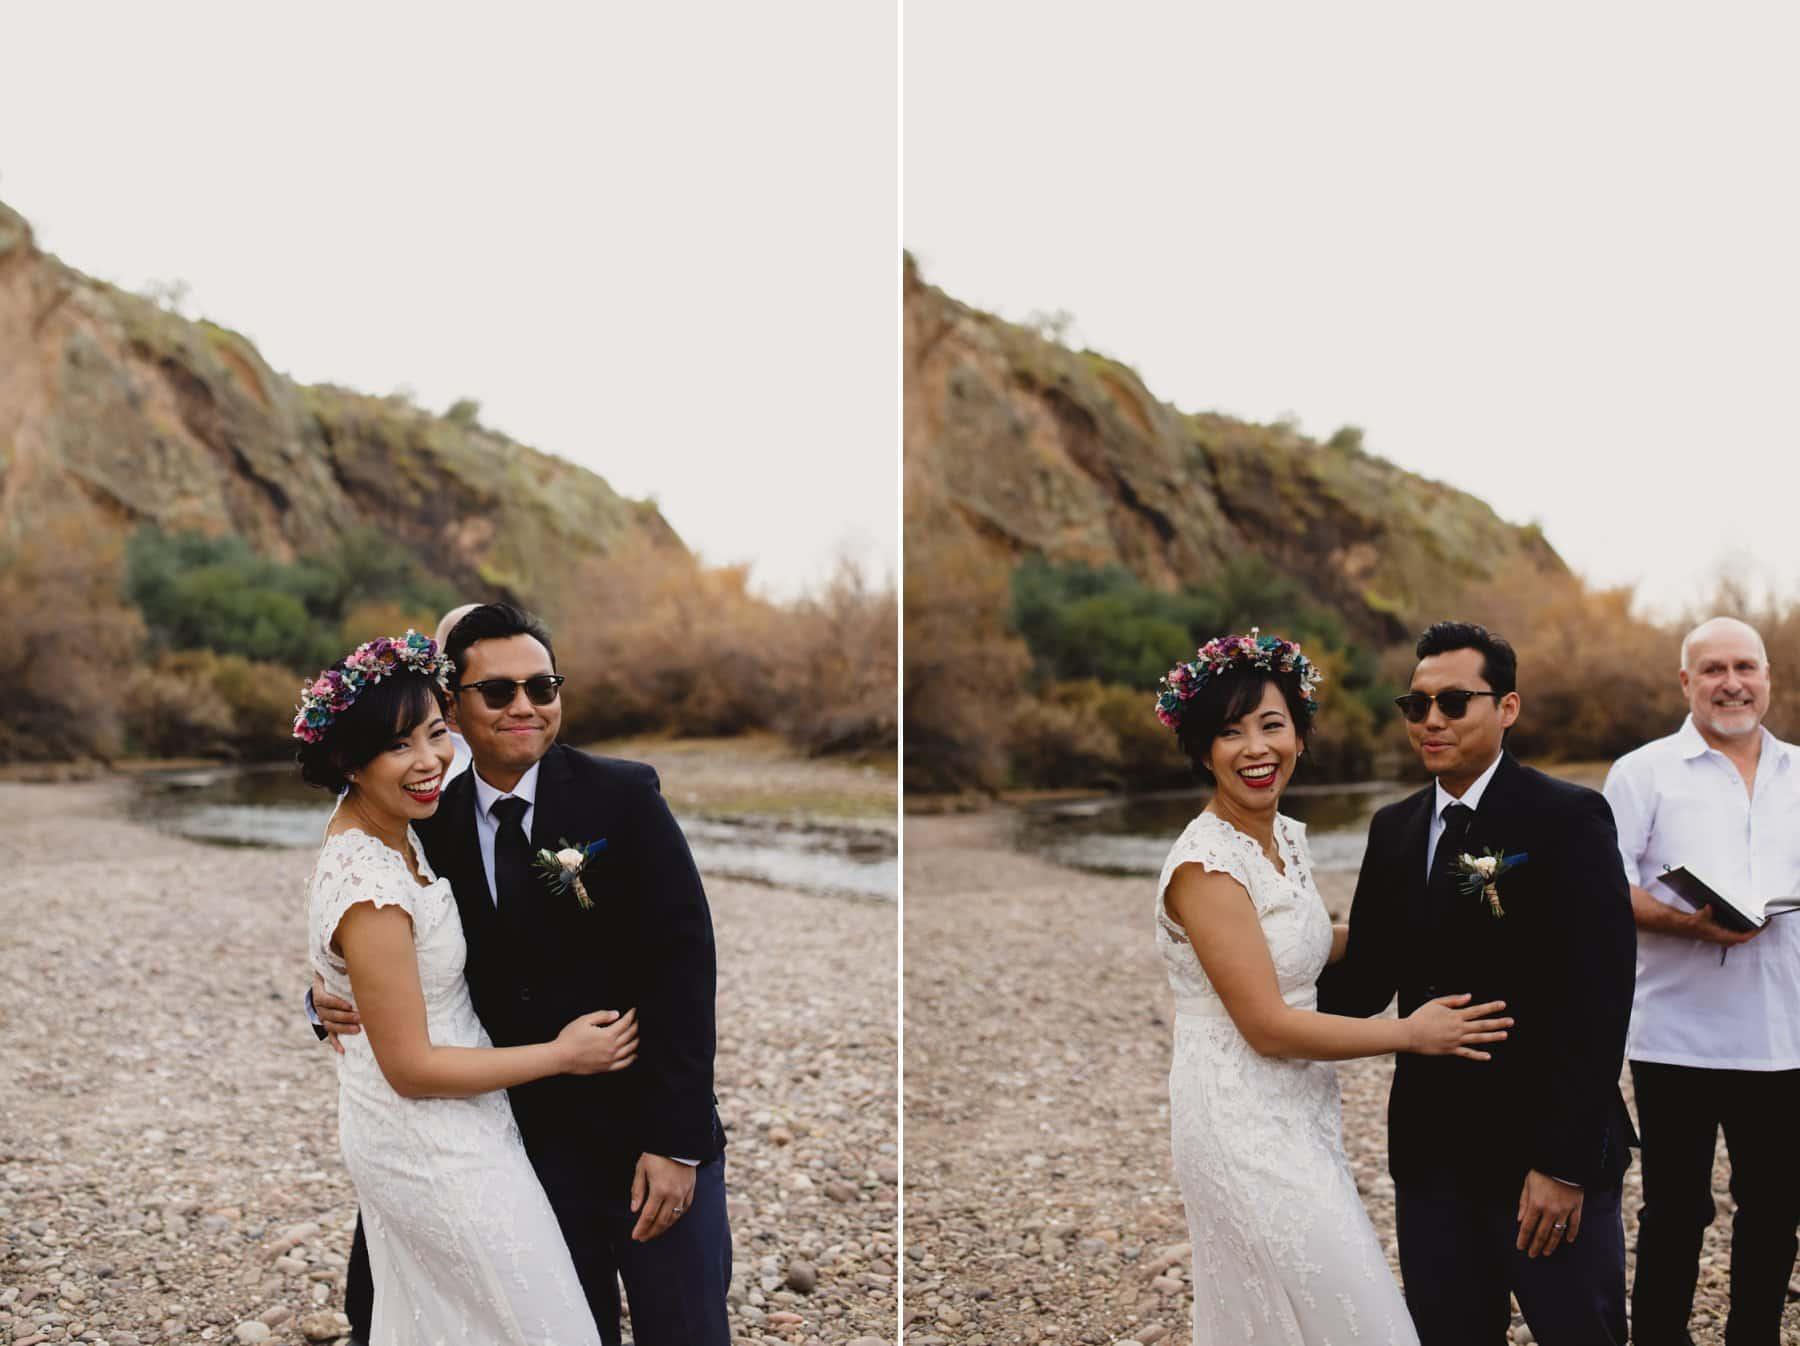 wedding ceremony at Salt River in winter in Arizona